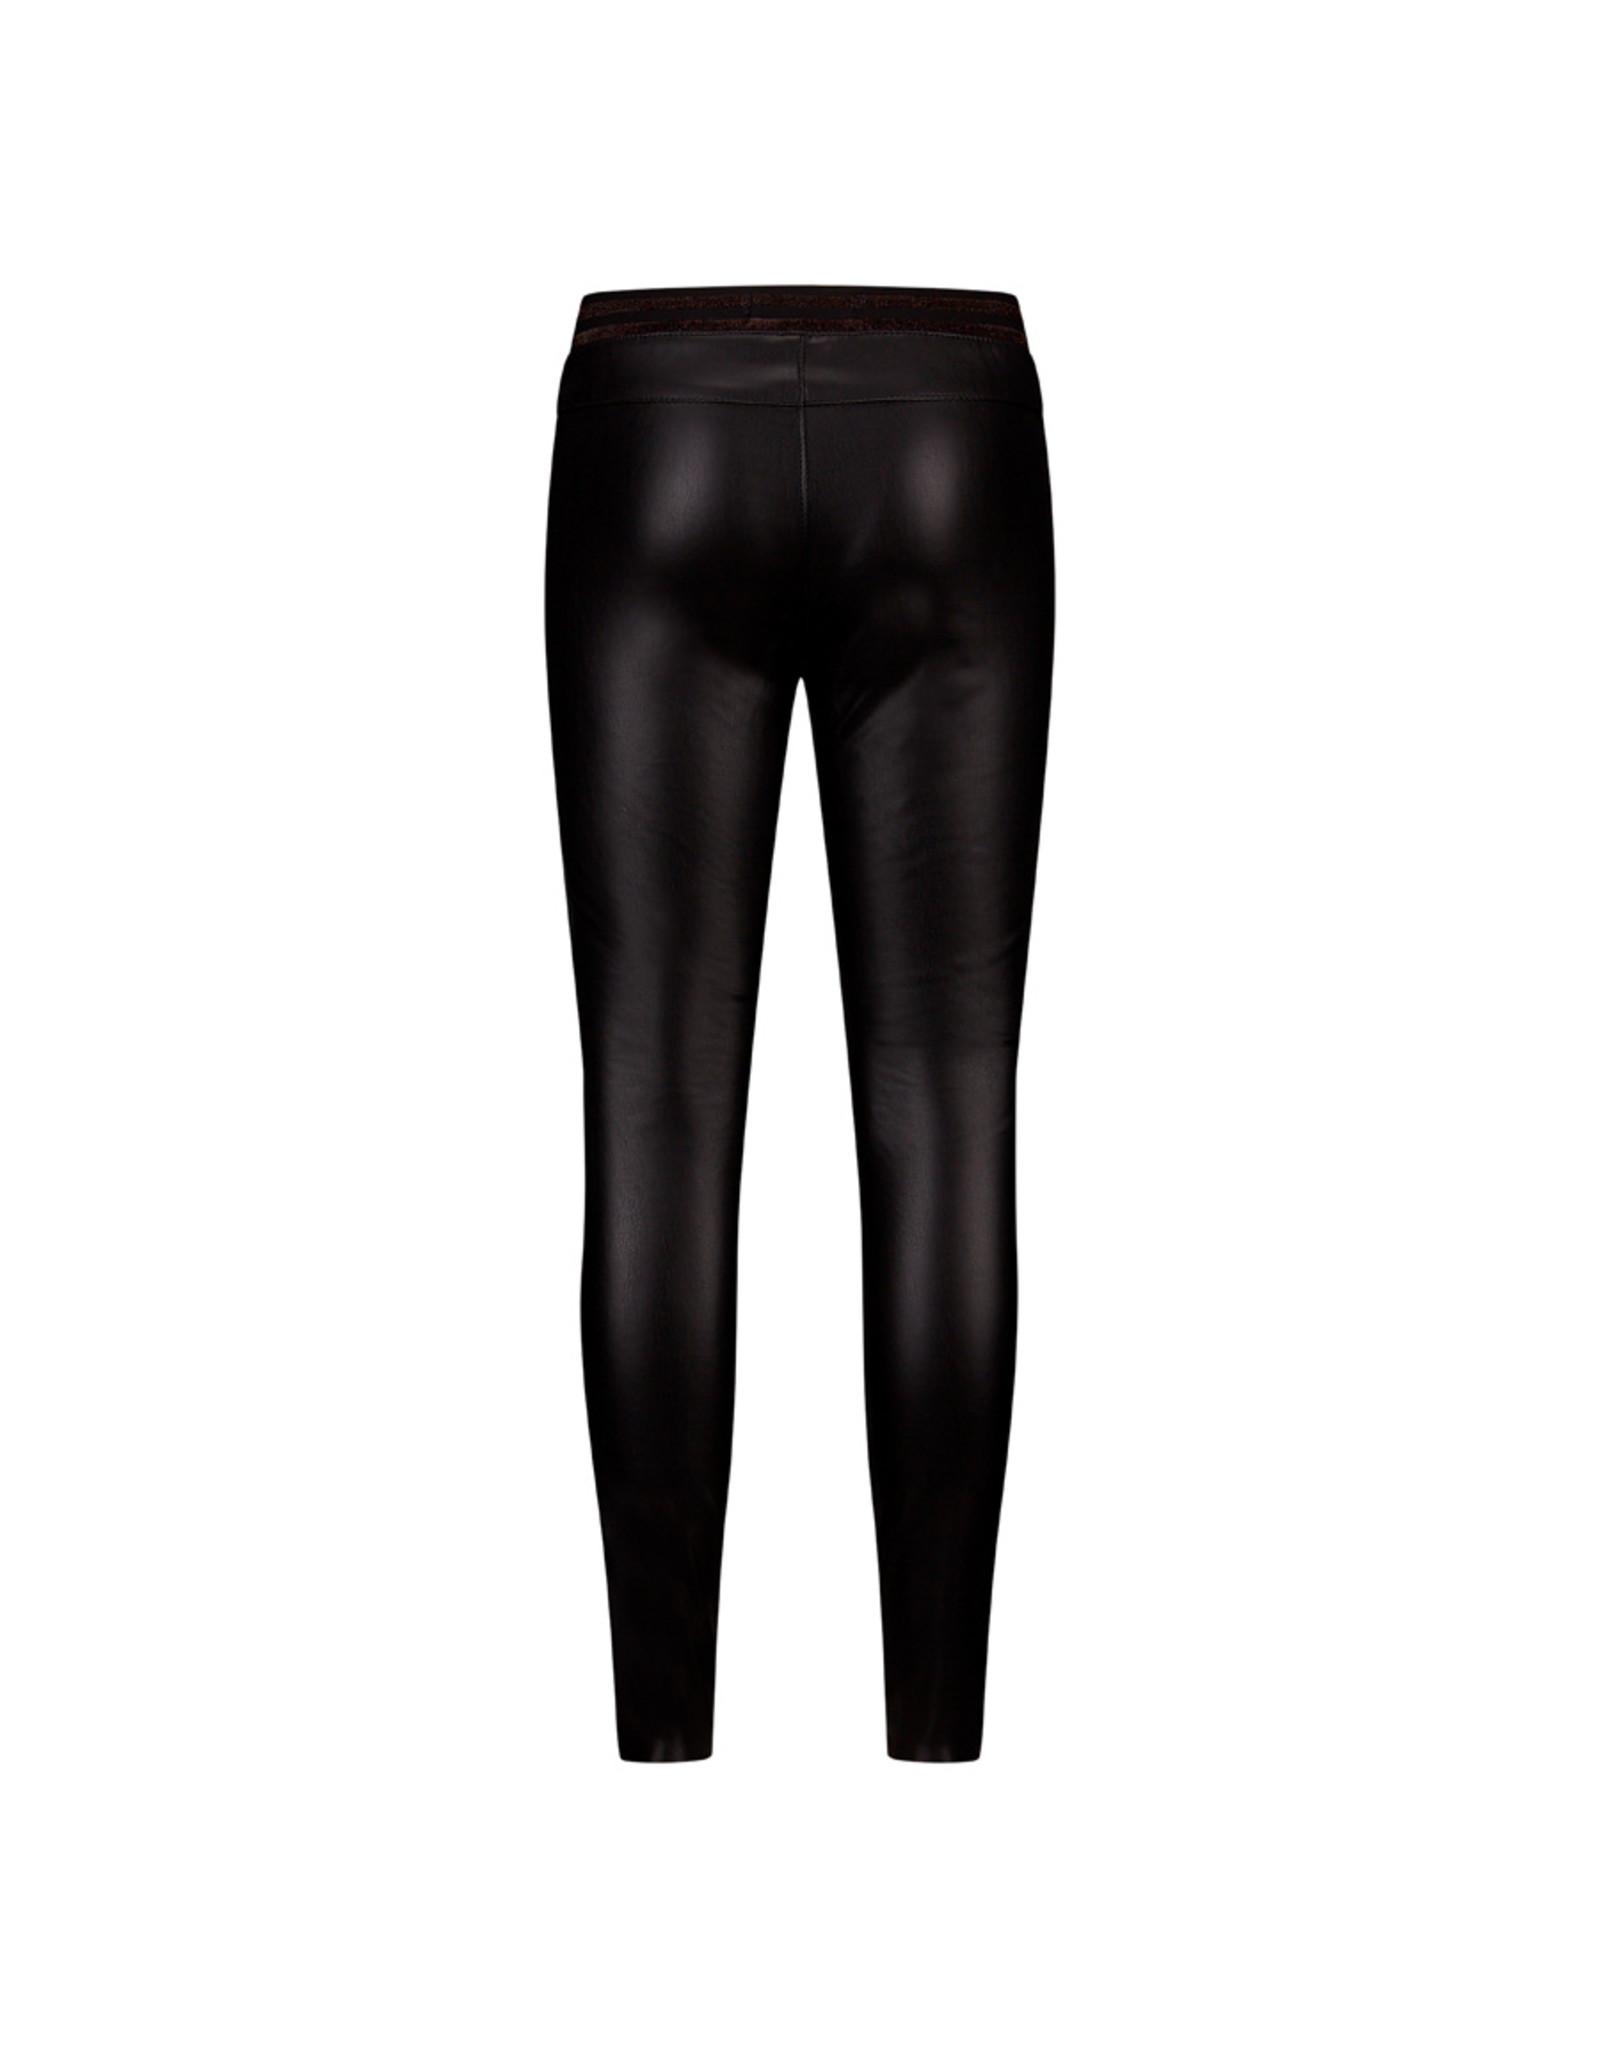 Retour Jeans Girls Ivy Pants Black